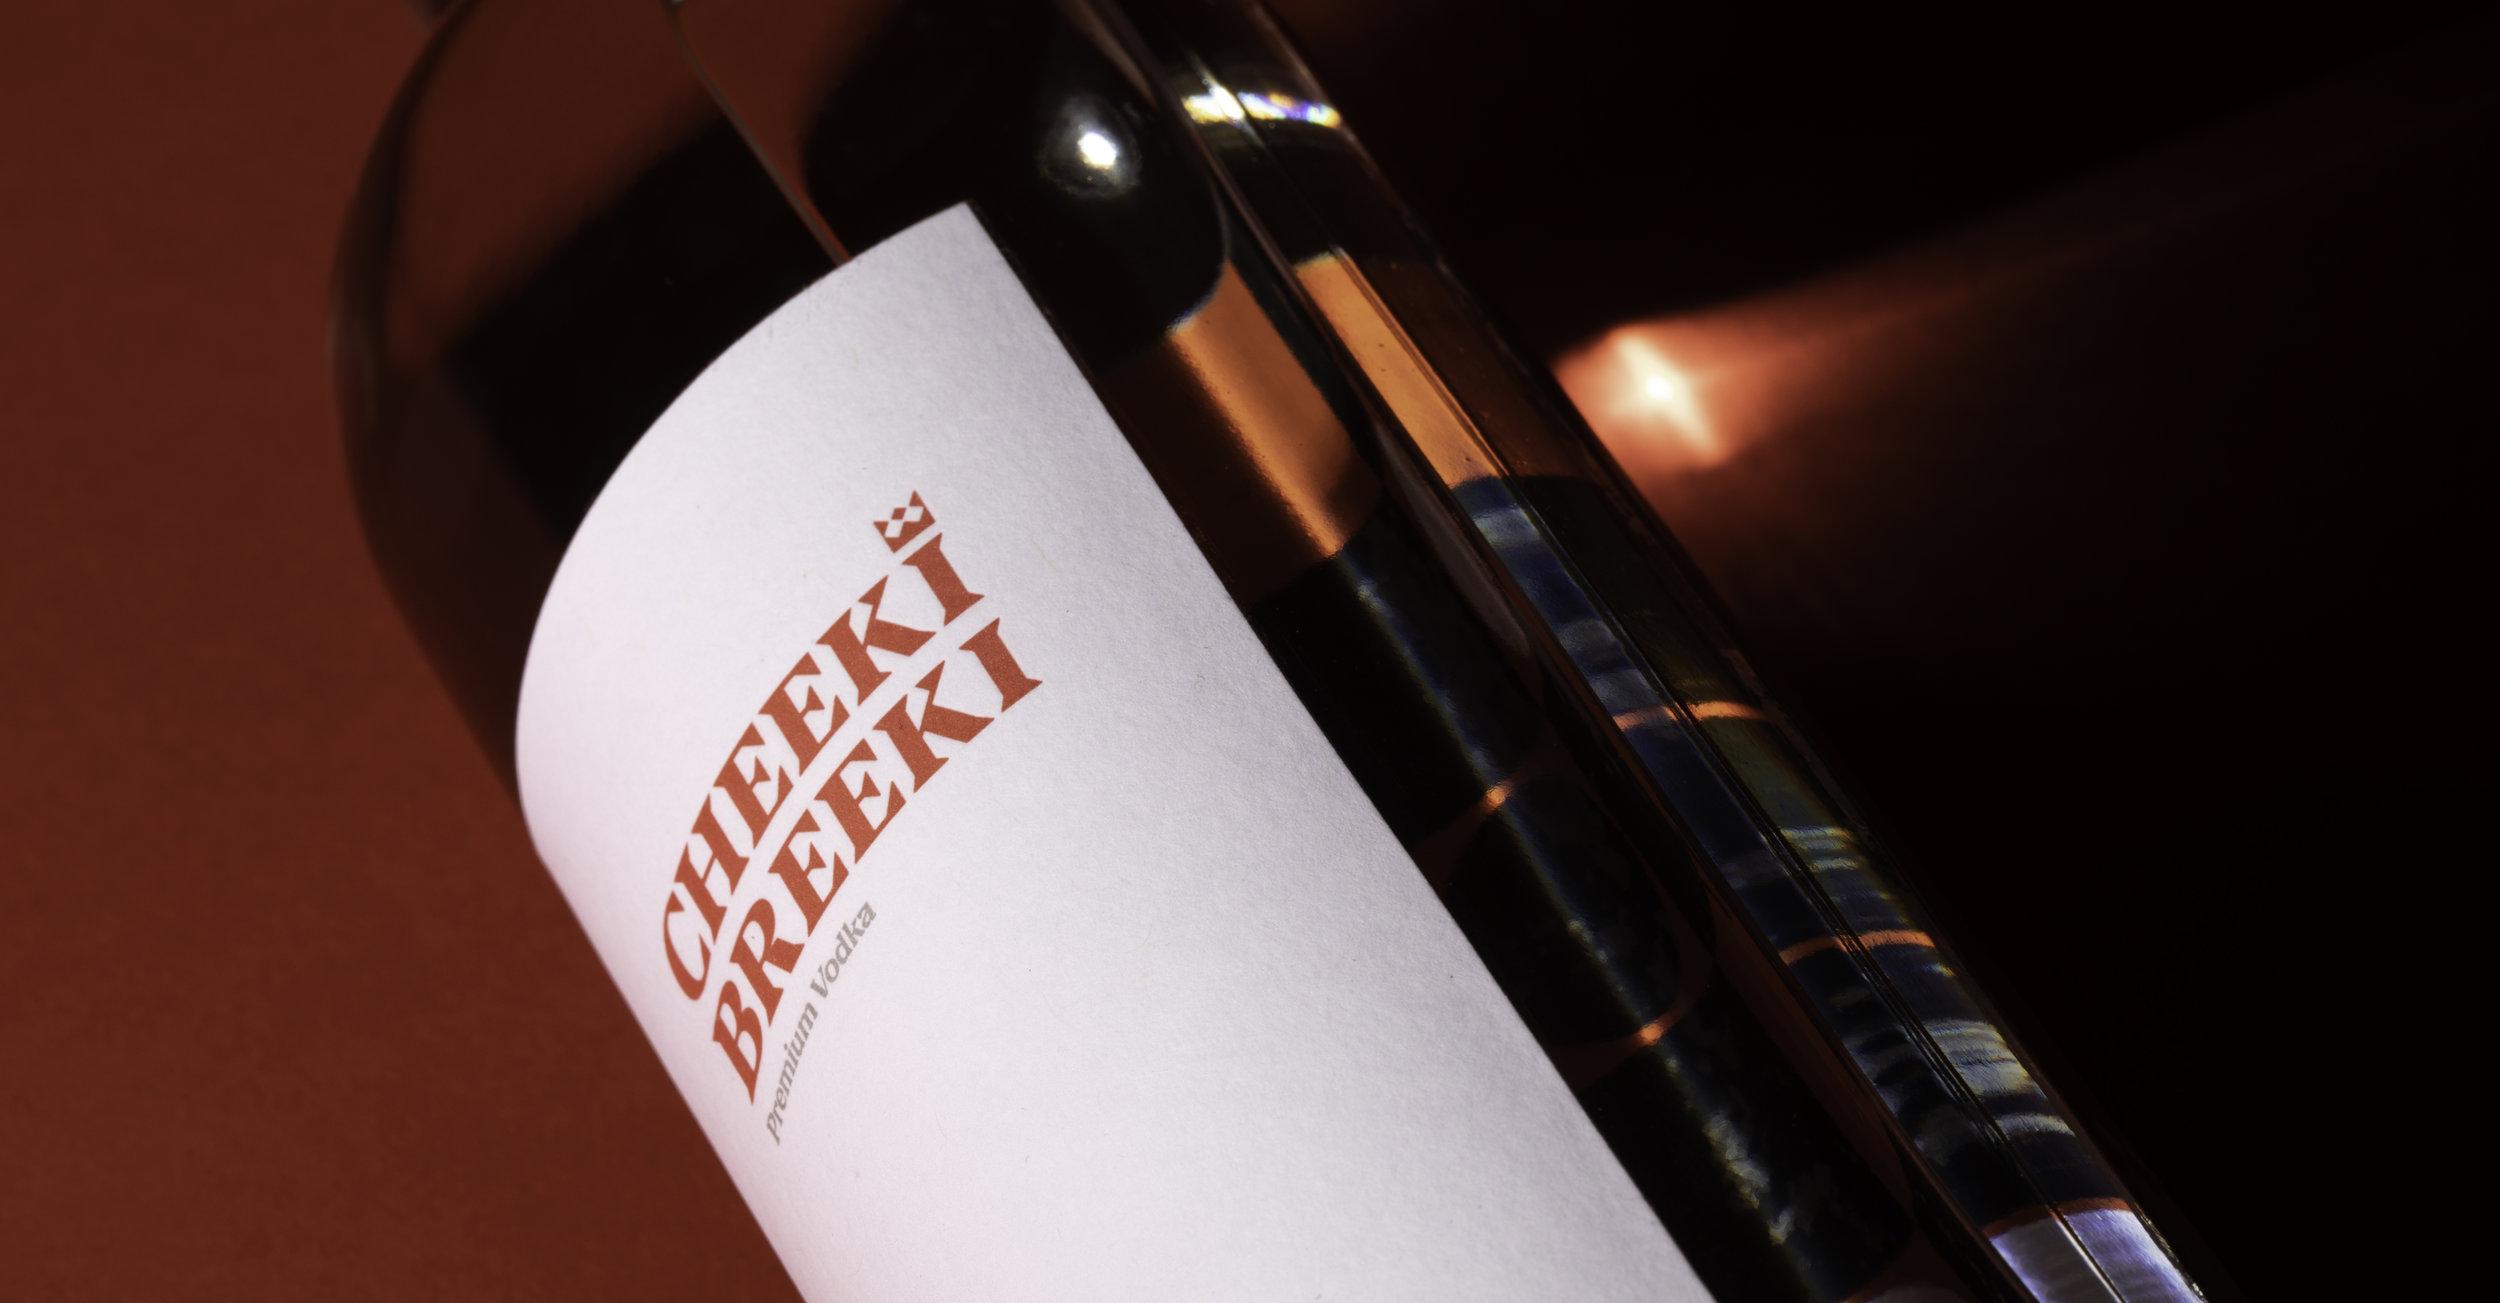 Cheeki Breeki Bottle Photography done by Lazaris in their studio in Portland, Oregon.